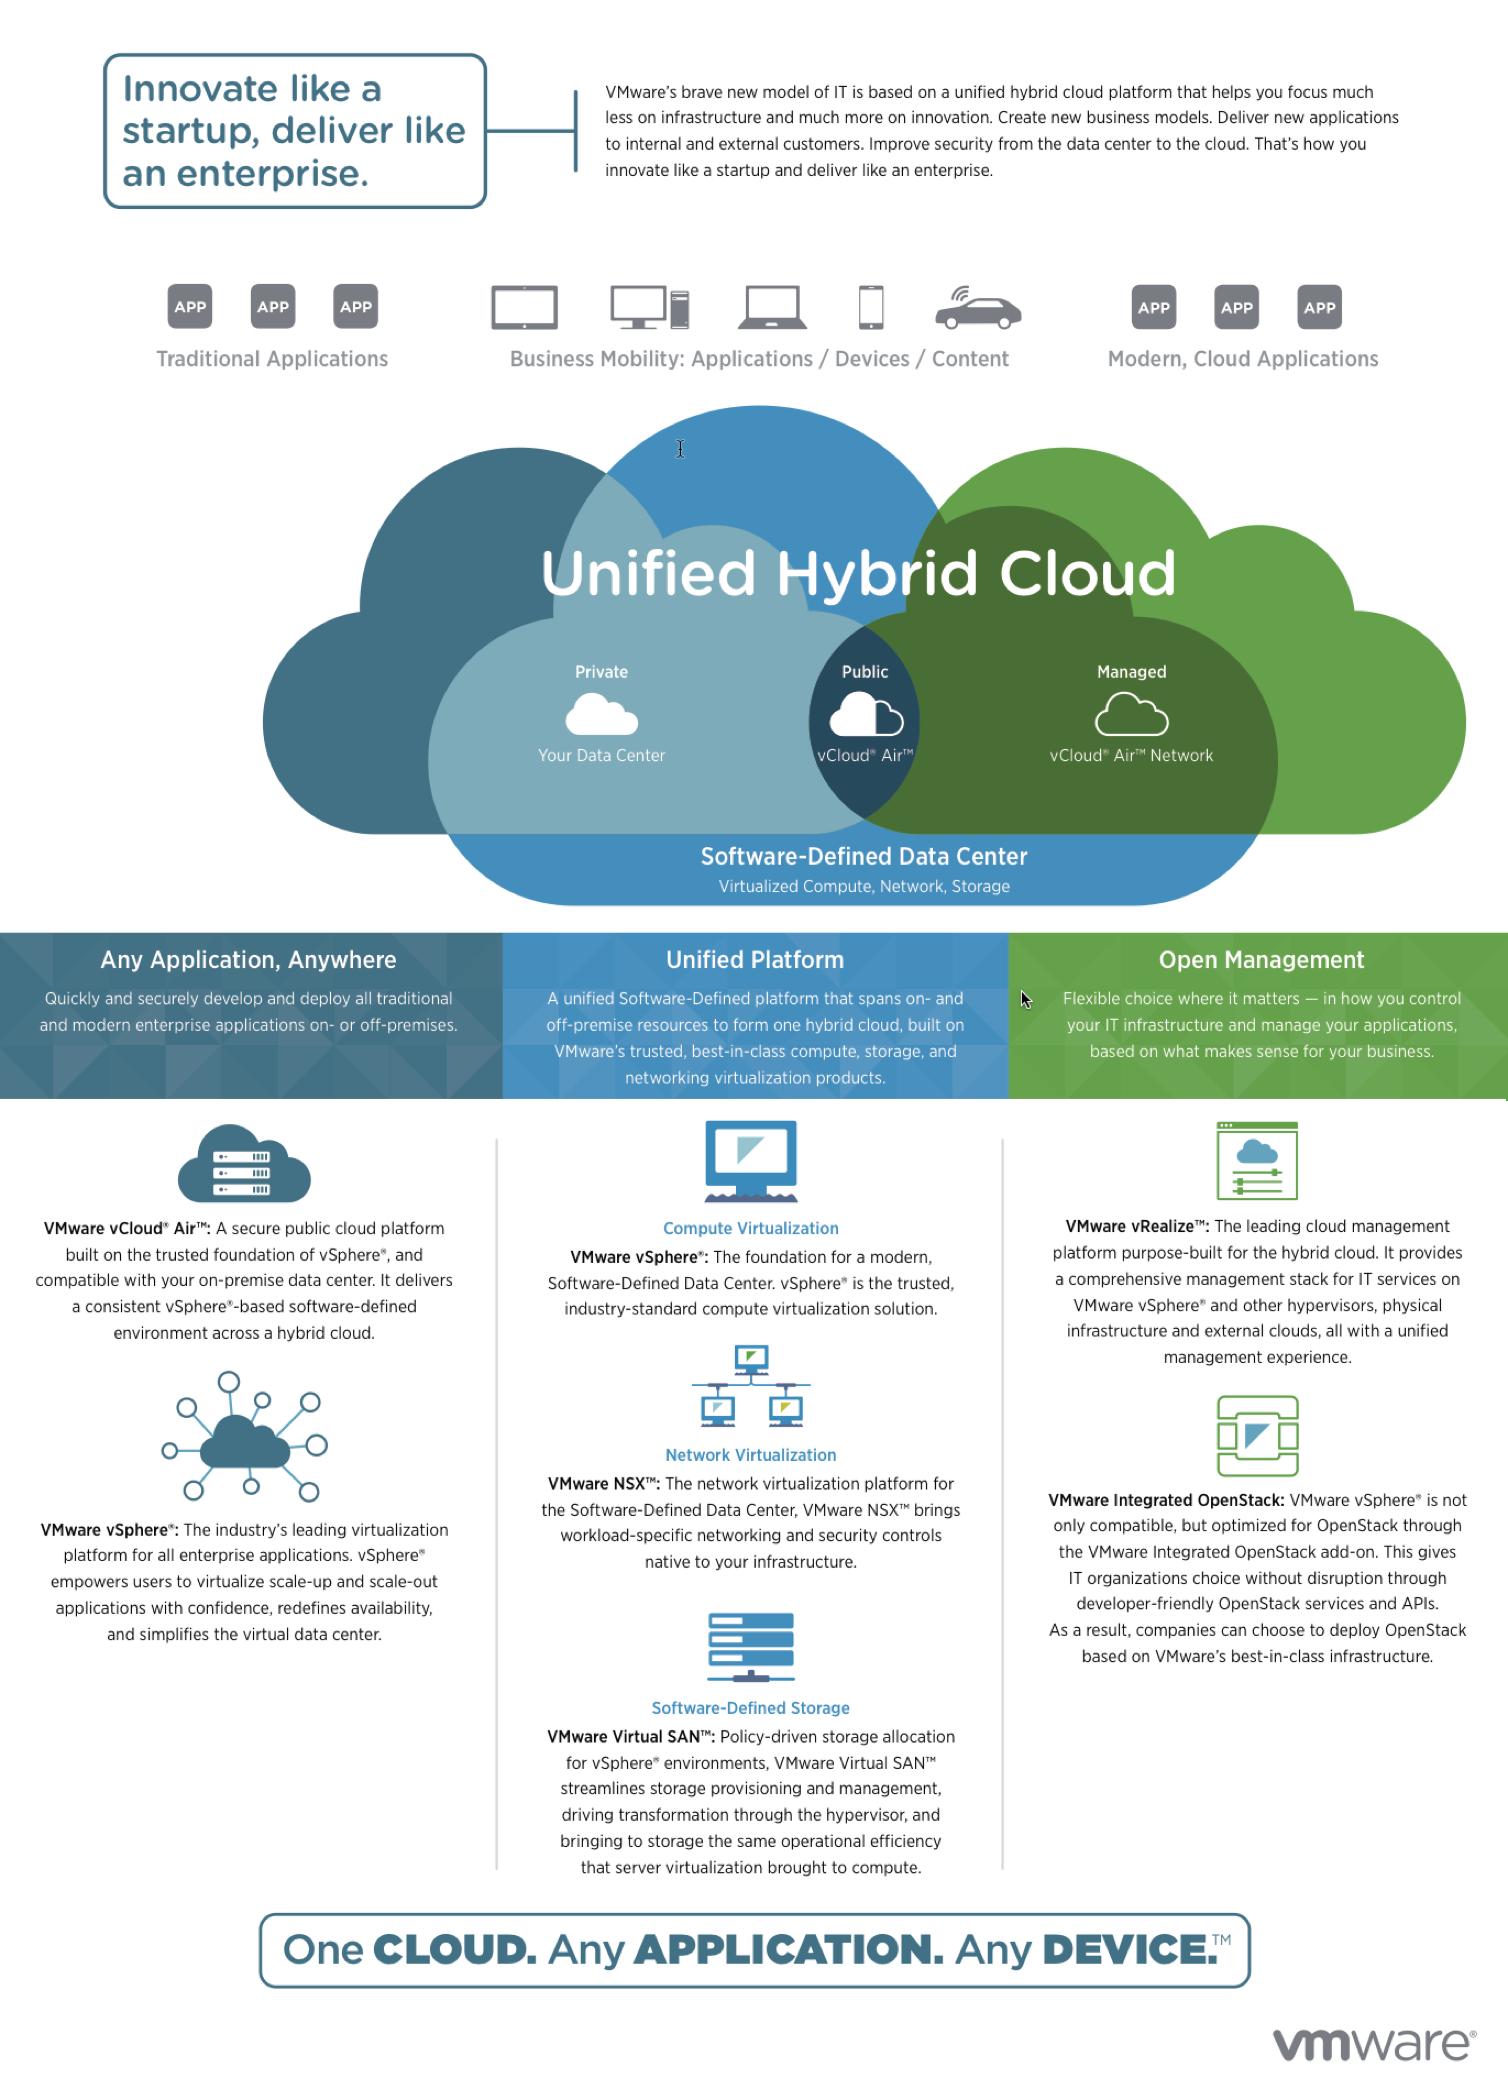 Hybrid Cloud Storage Use Cases